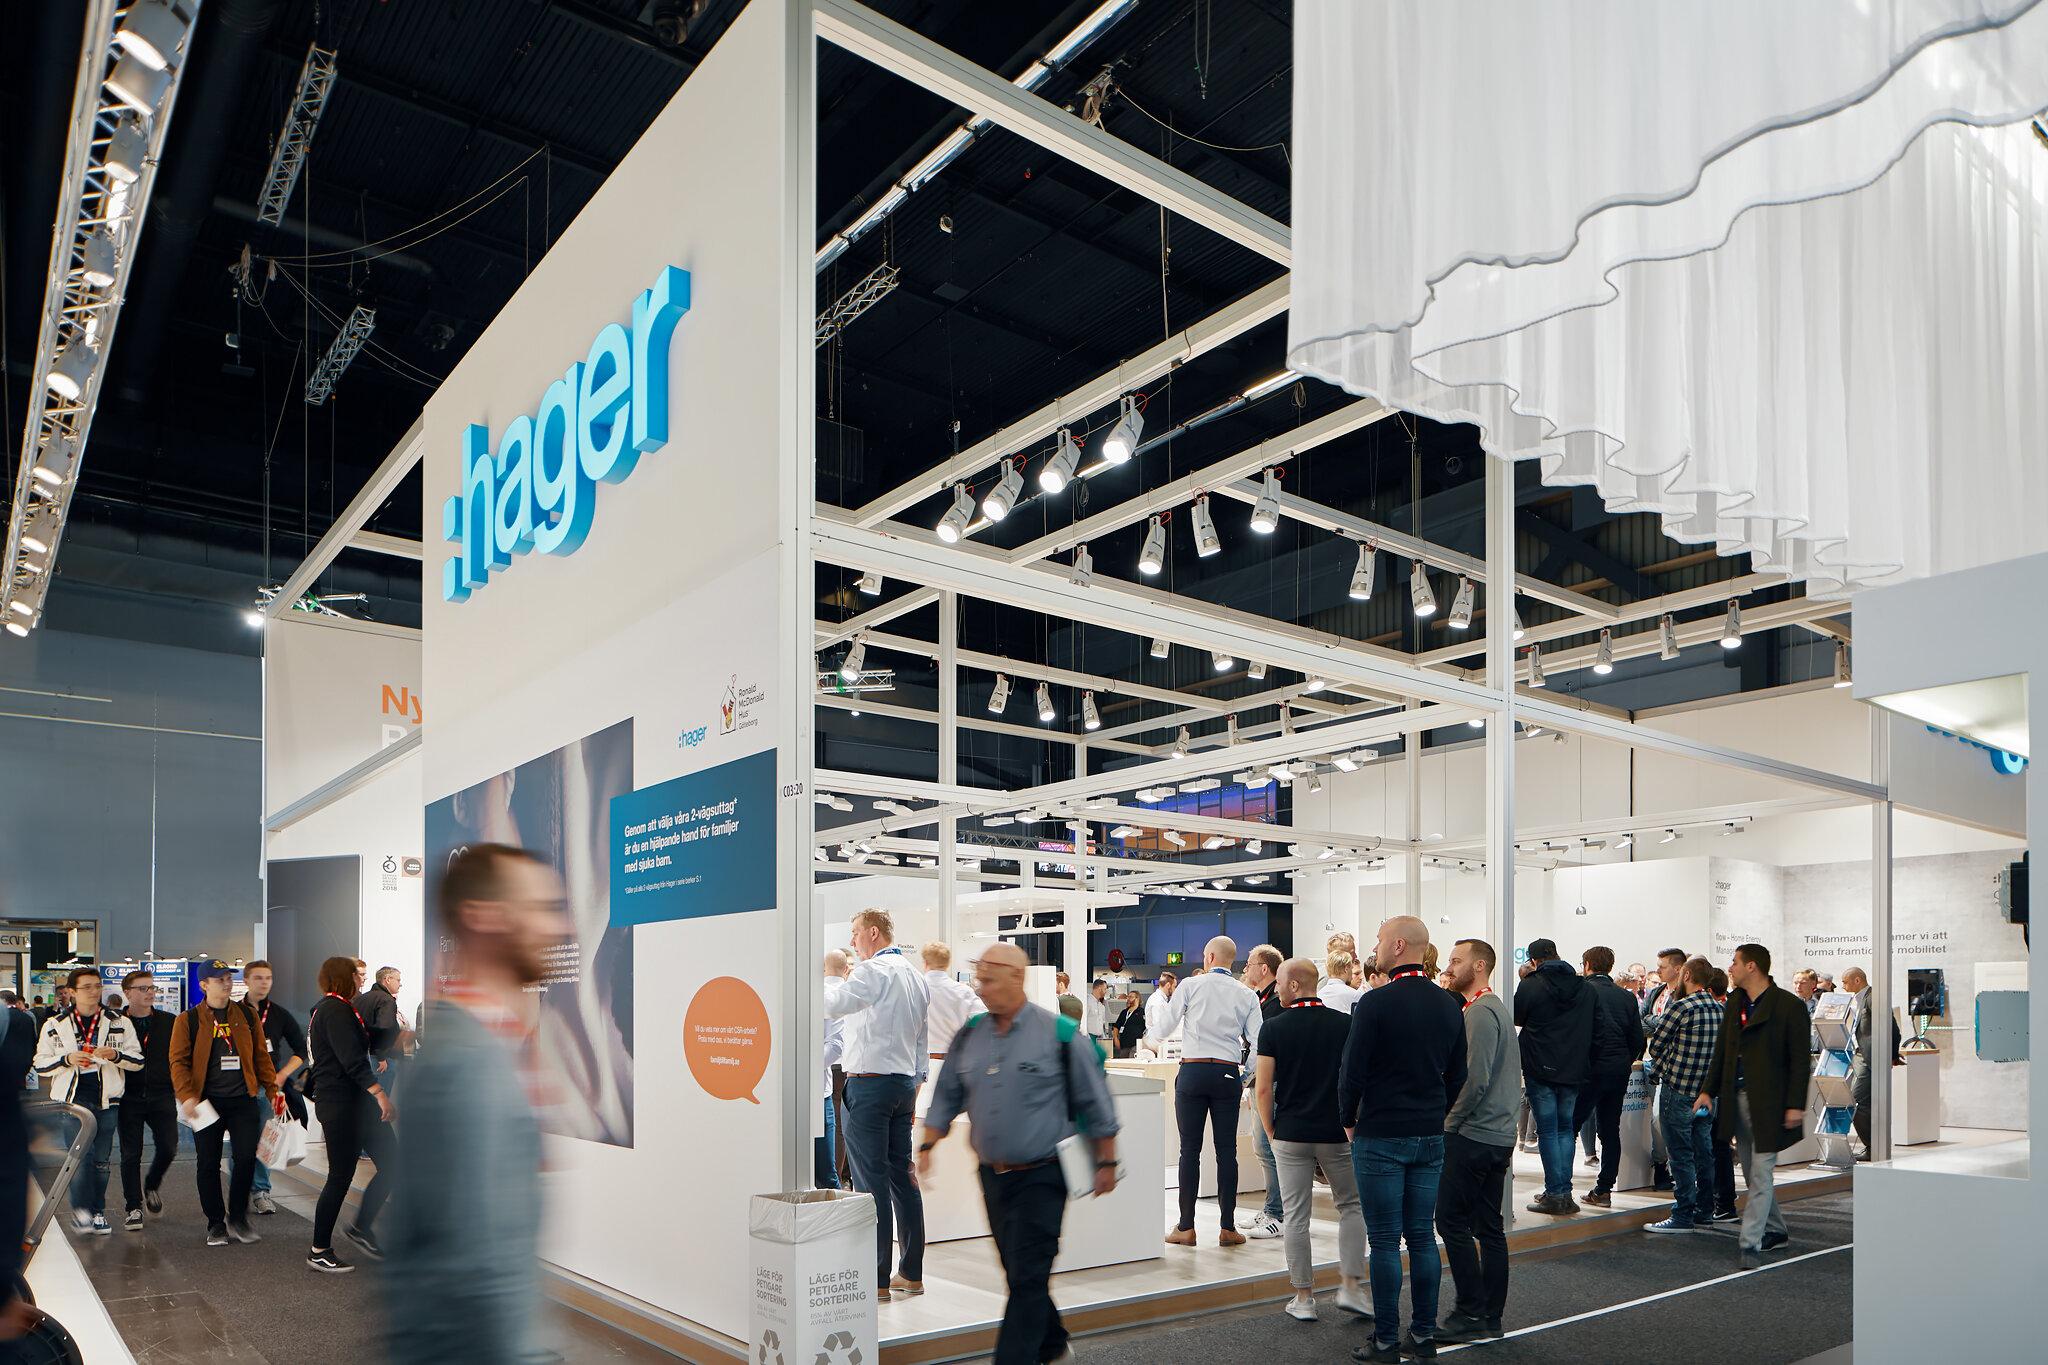 hager-elfack-201905-lowres-srgb-pic11.jpg